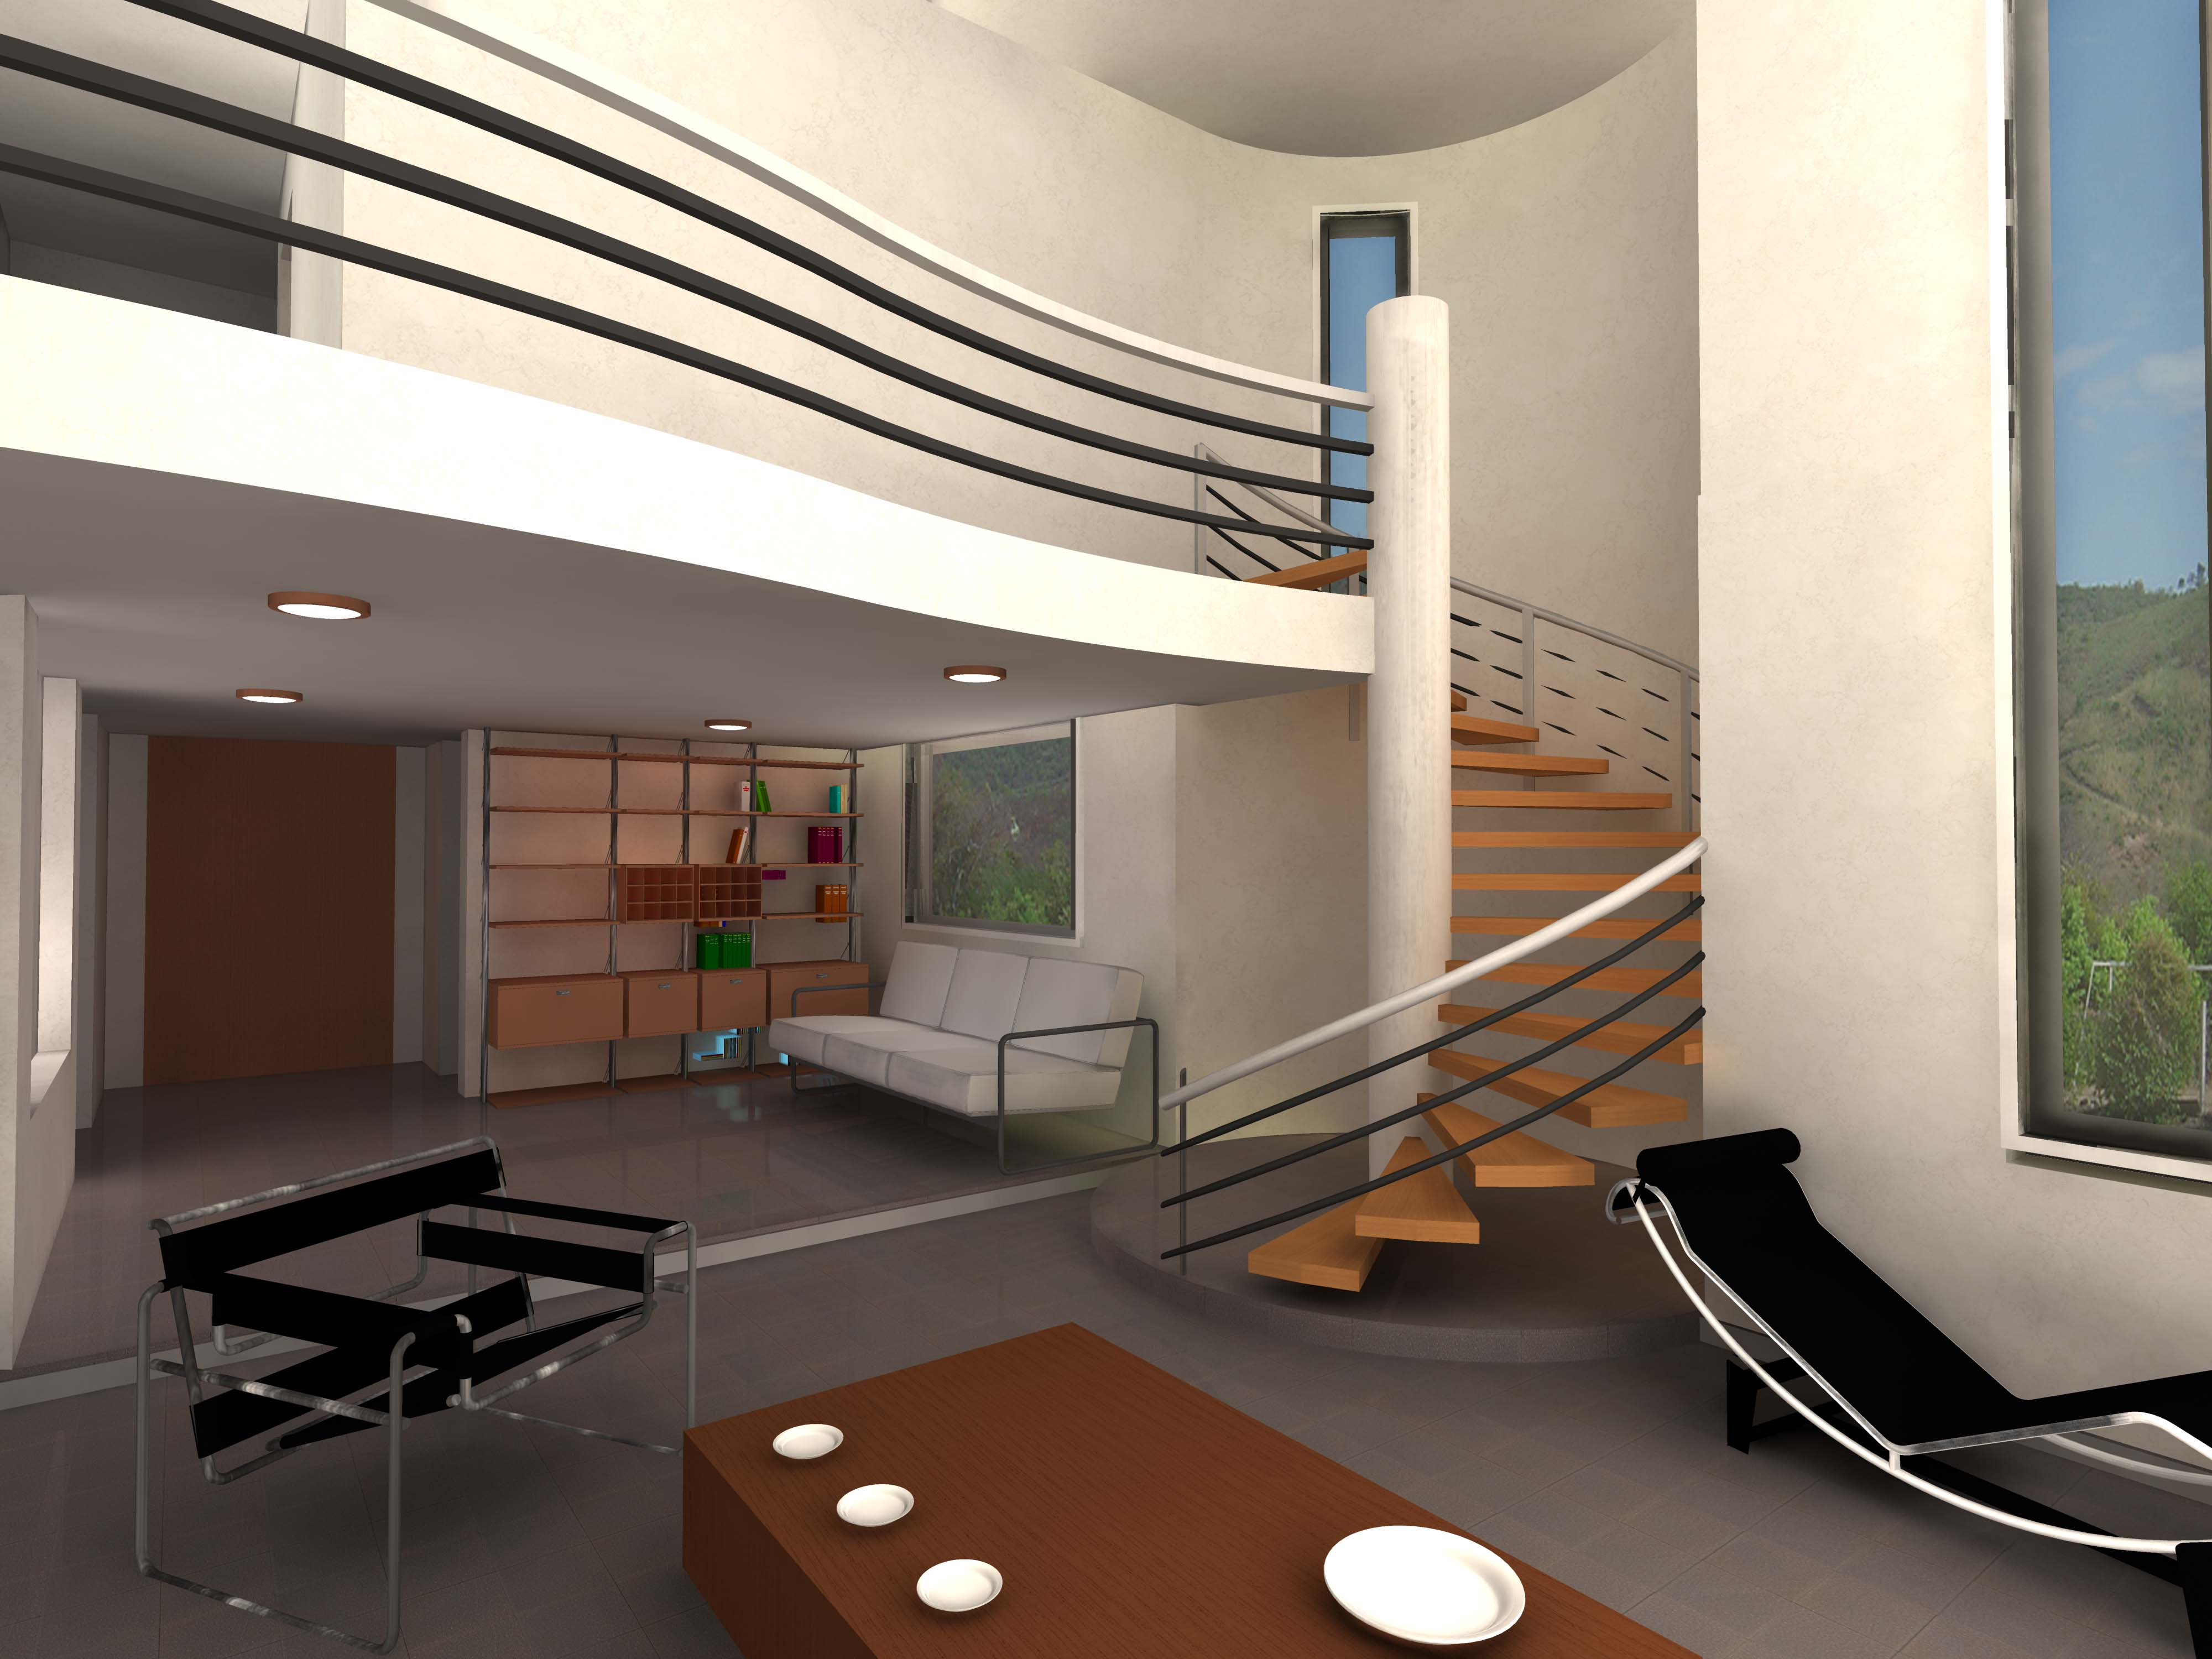 Conjunto Girardot Arquitectura Integral # Muebles Girardot